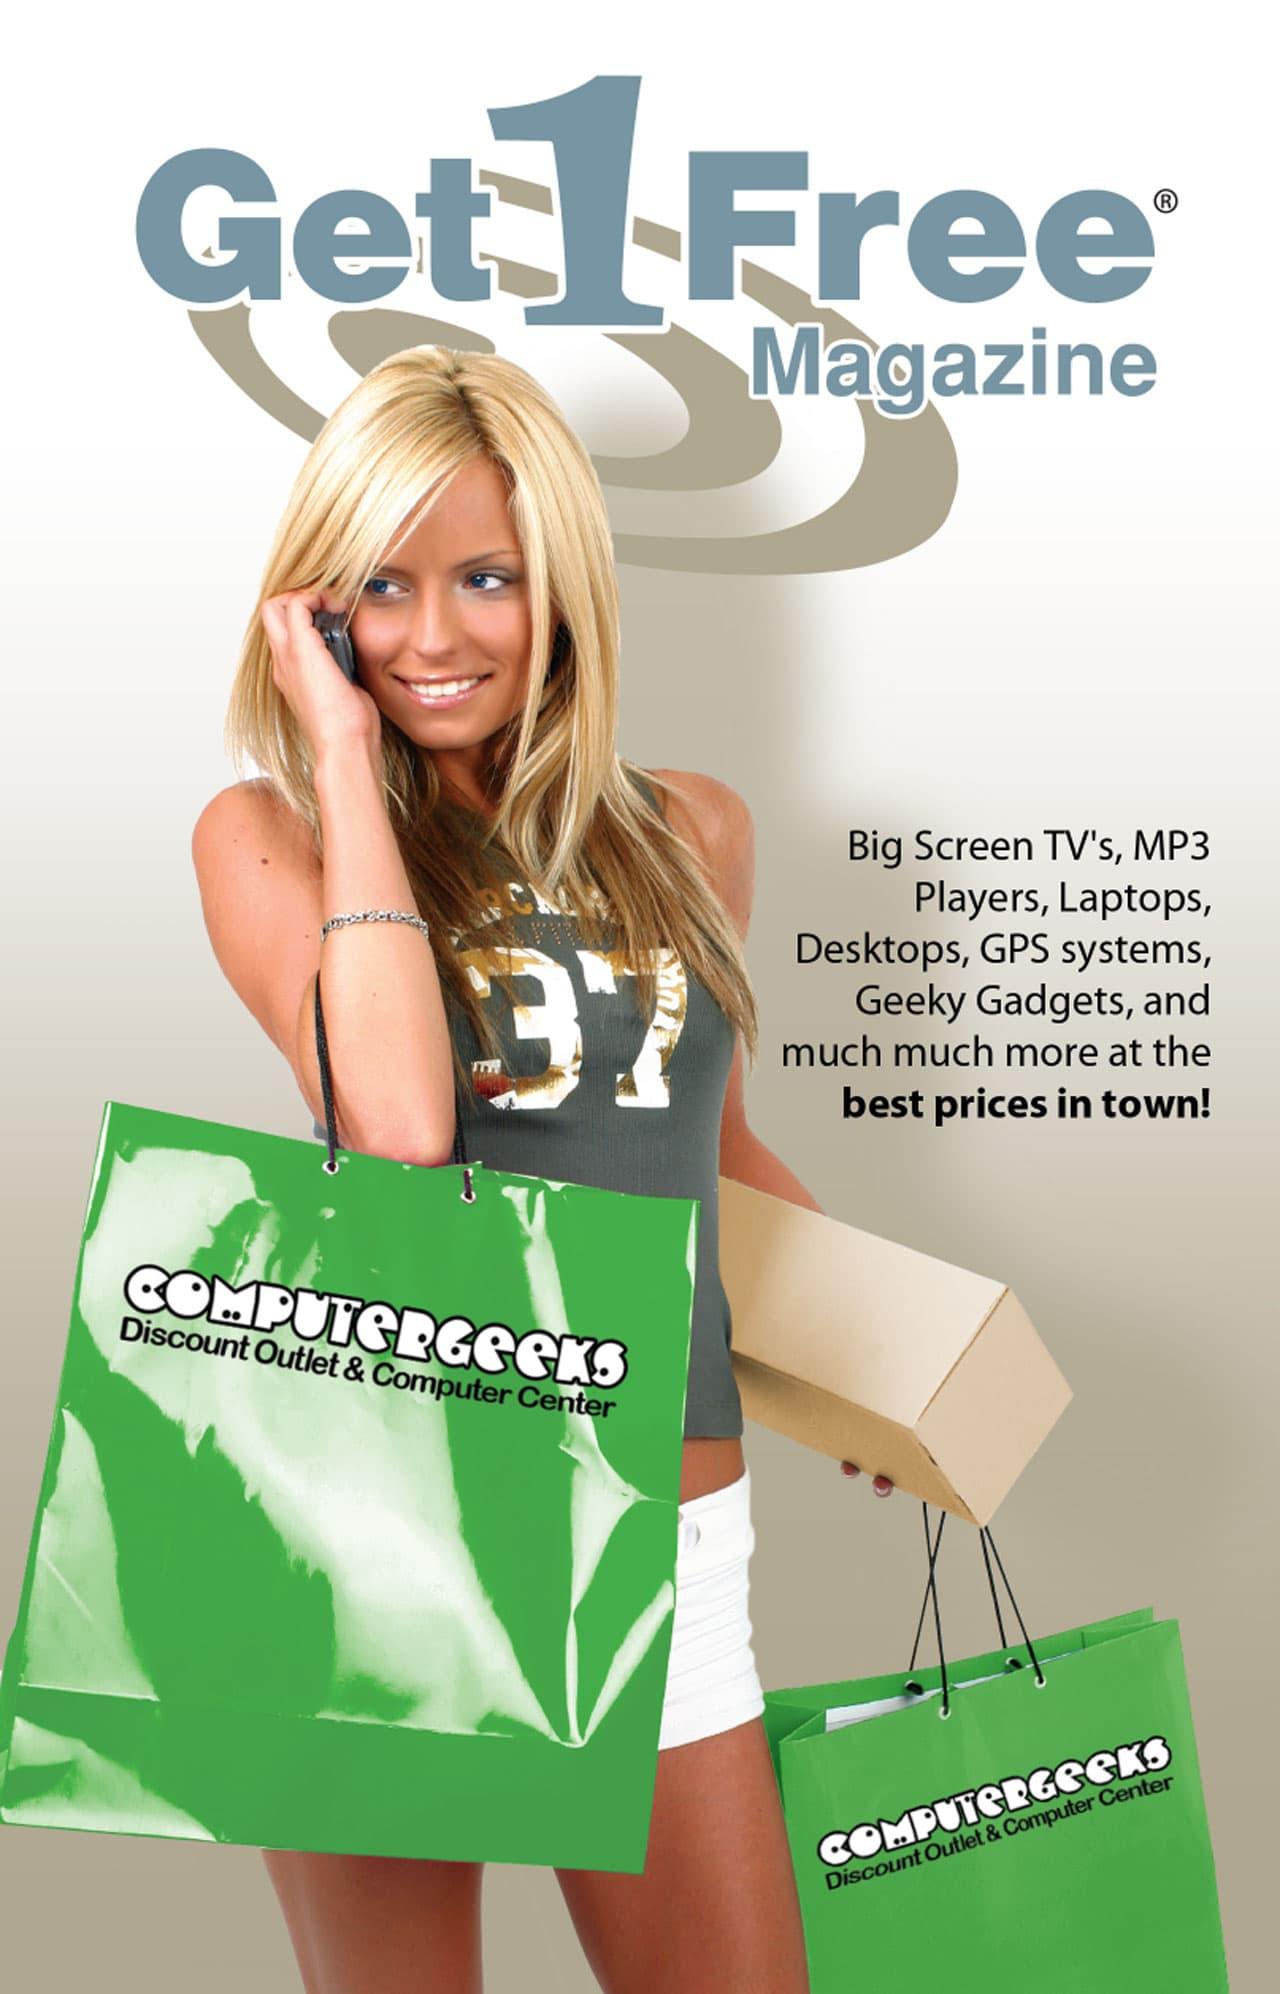 Get 1 Free Magazine cover